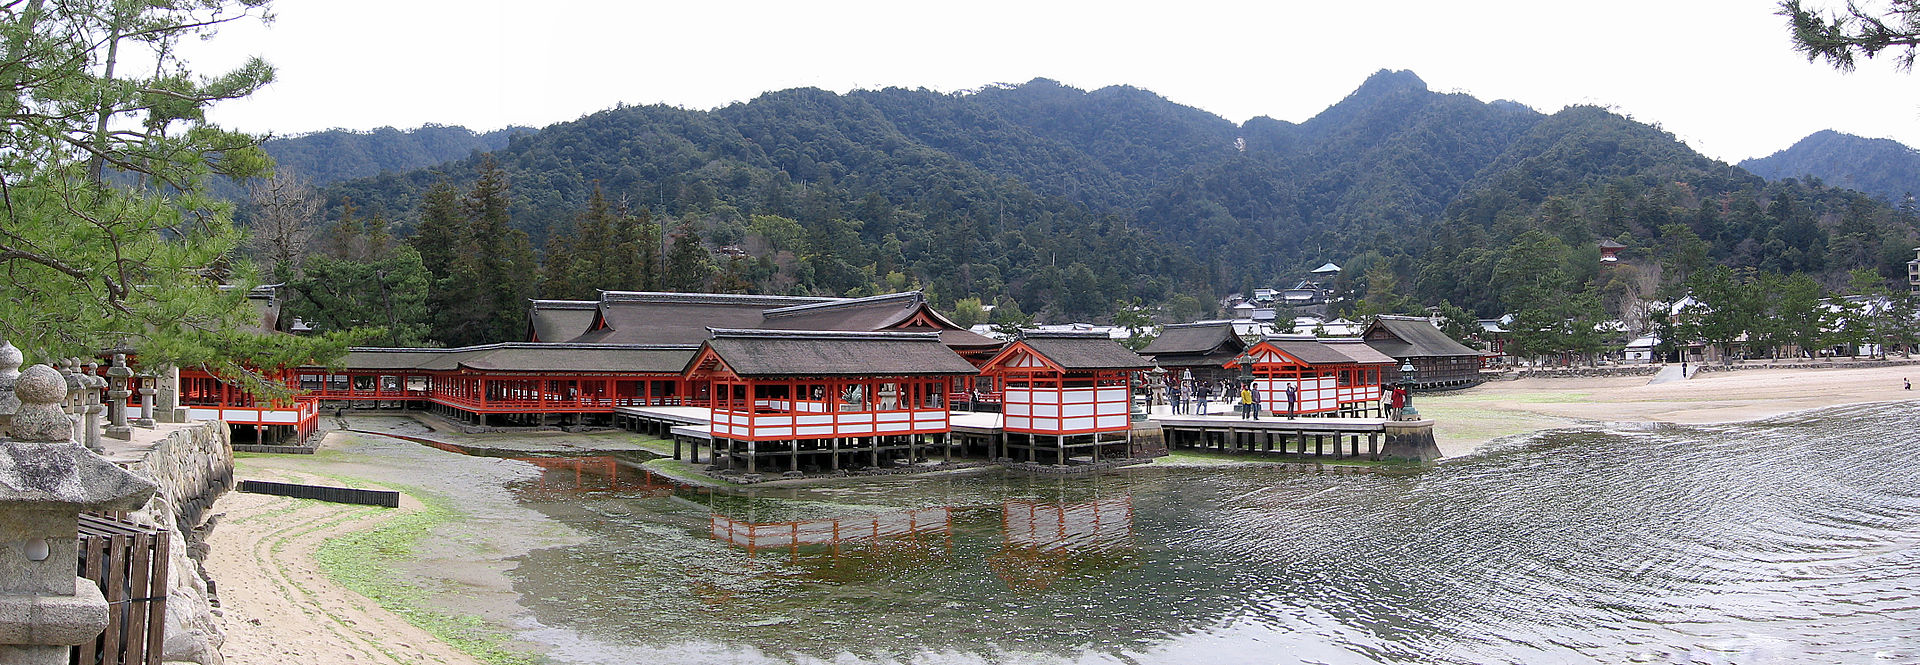 http://upload.wikimedia.org/wikipedia/commons/thumb/c/ca/Itsukushima_%28pano%29.jpg/1920px-Itsukushima_%28pano%29.jpg